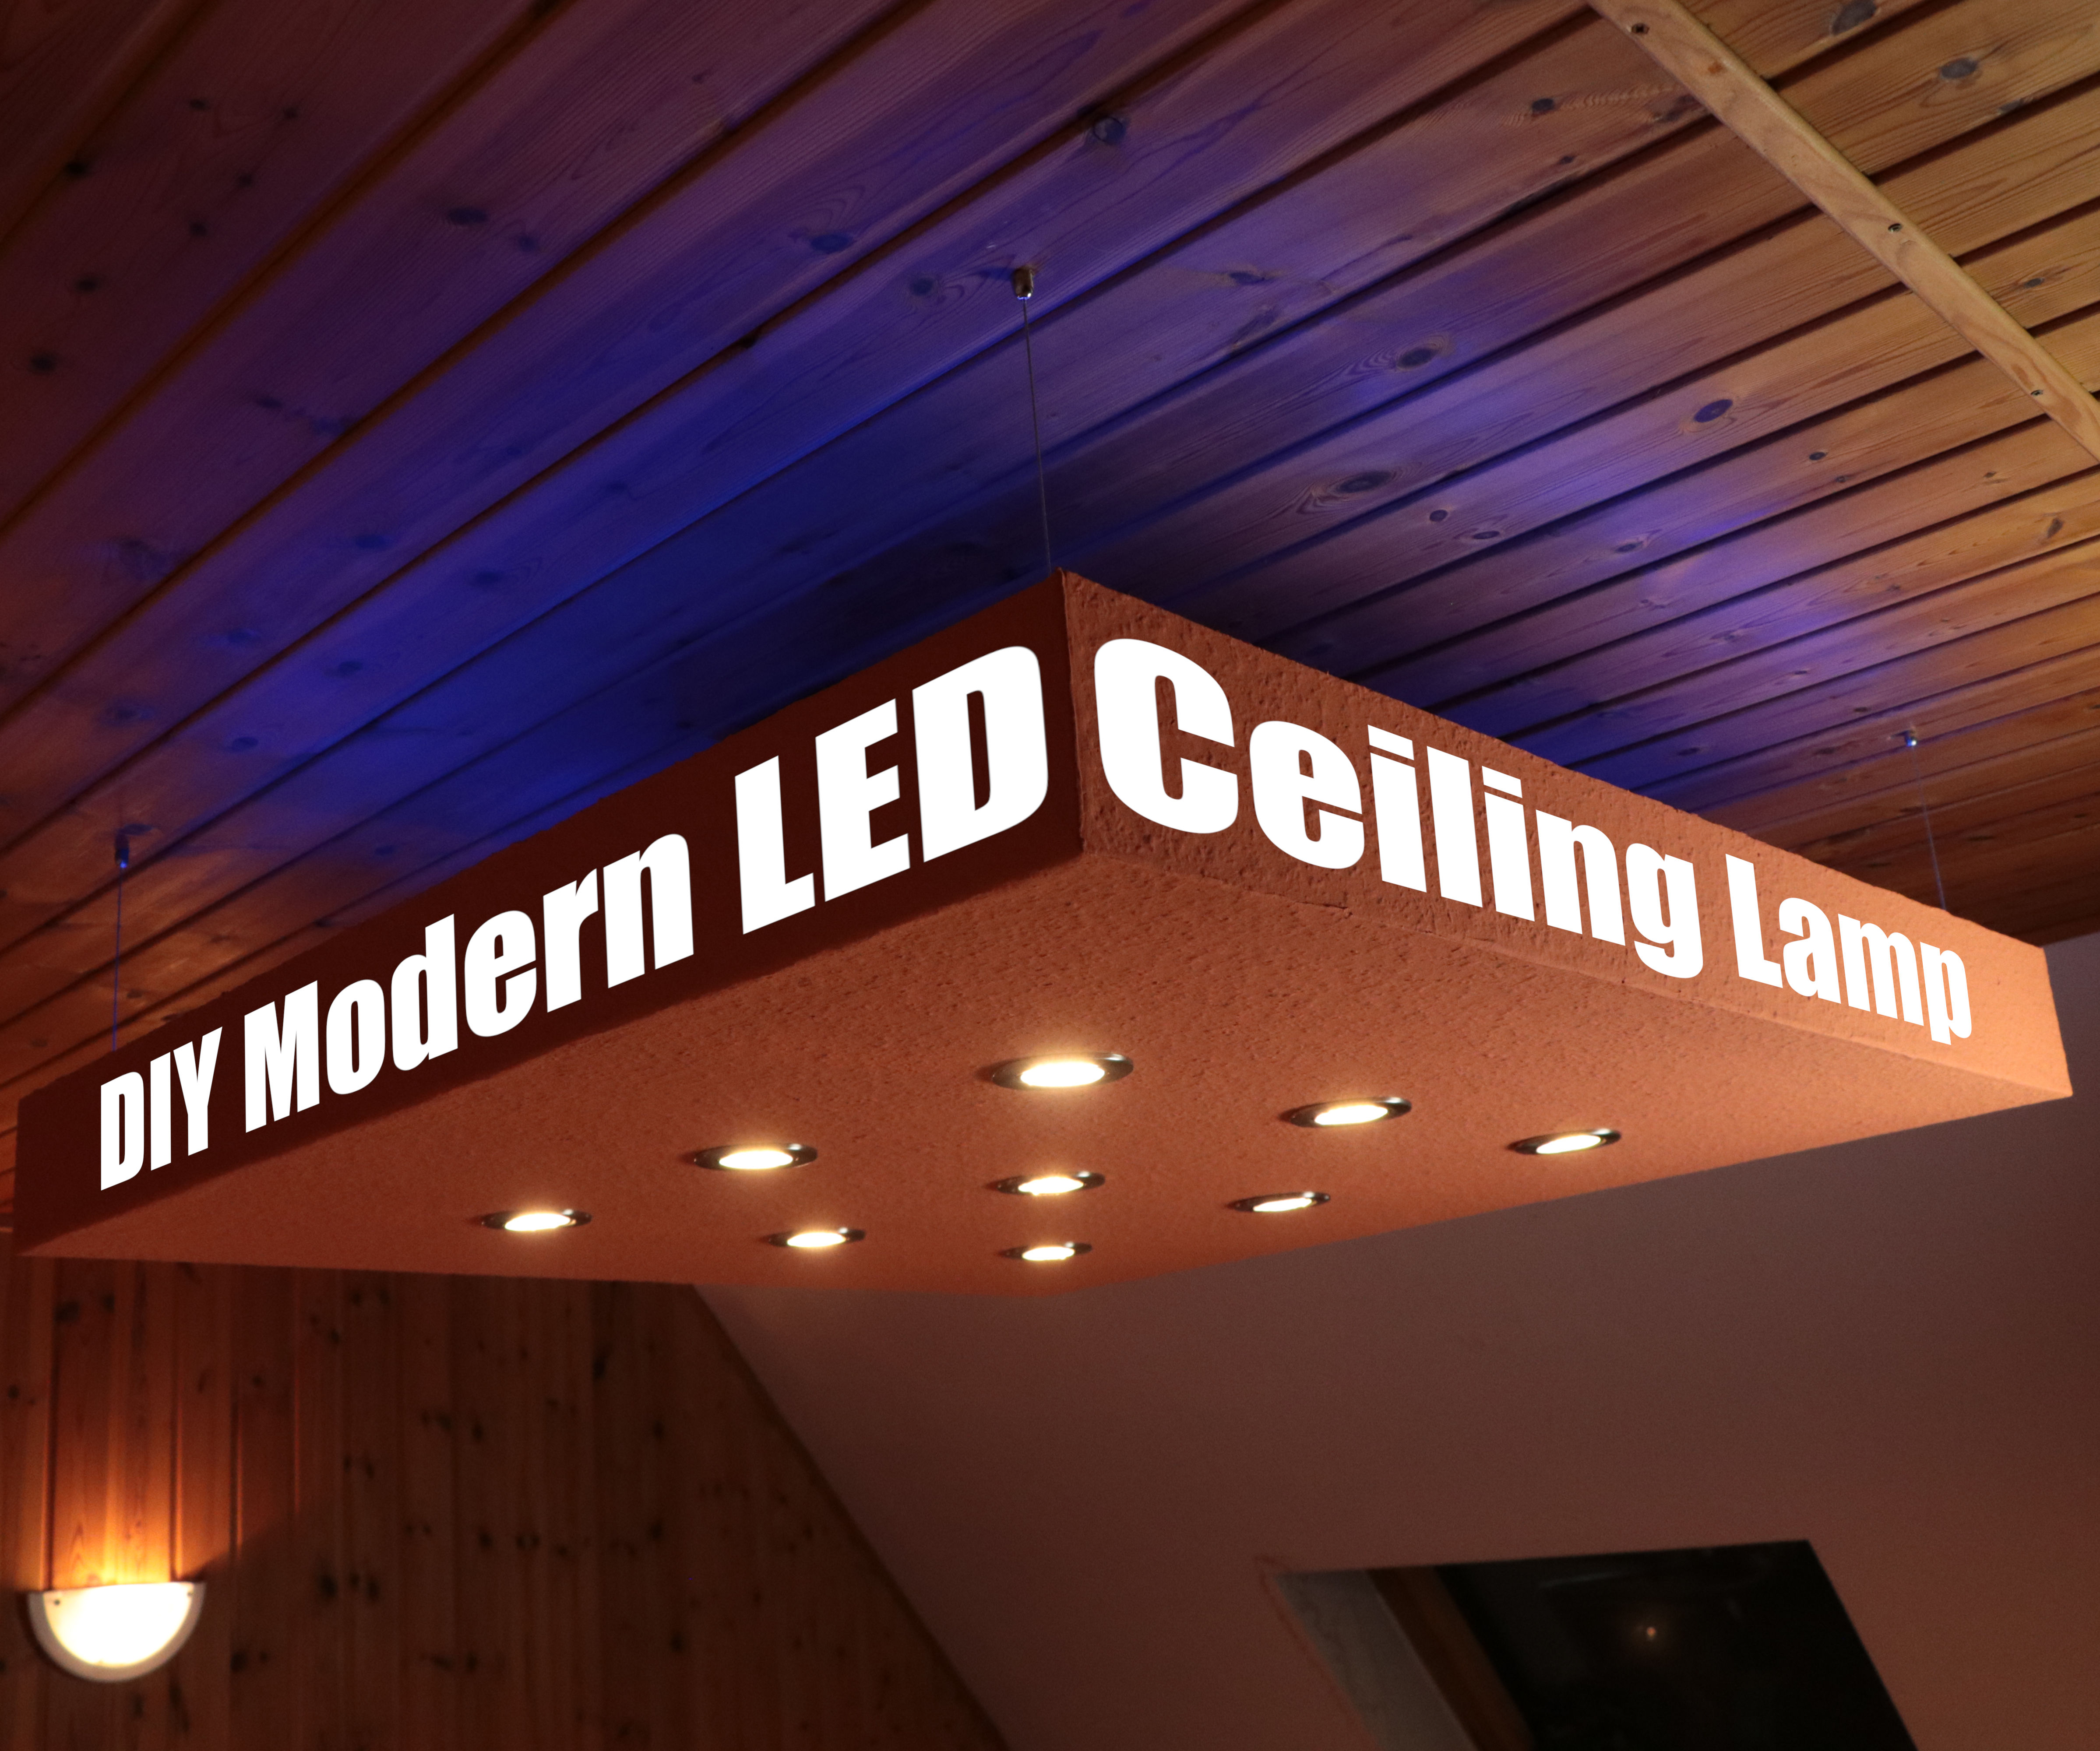 Make Your Own Modern LED Ceiling Lamp